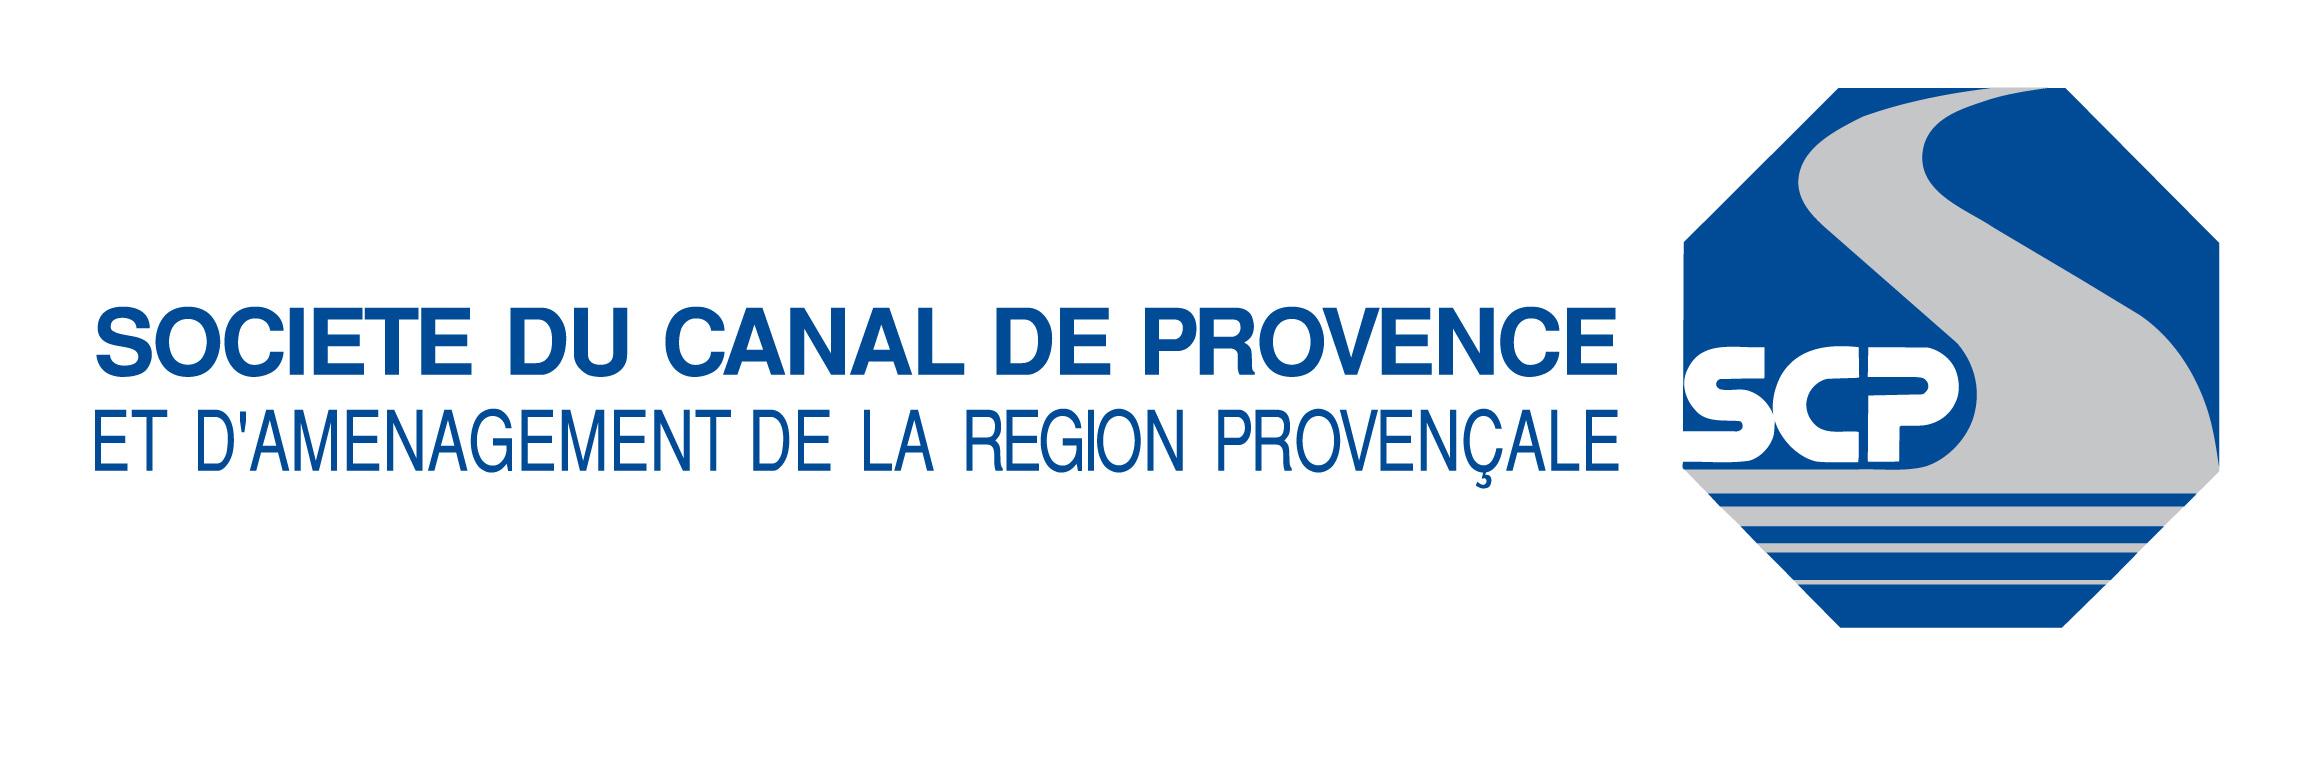 logo-scp-ss-adresse